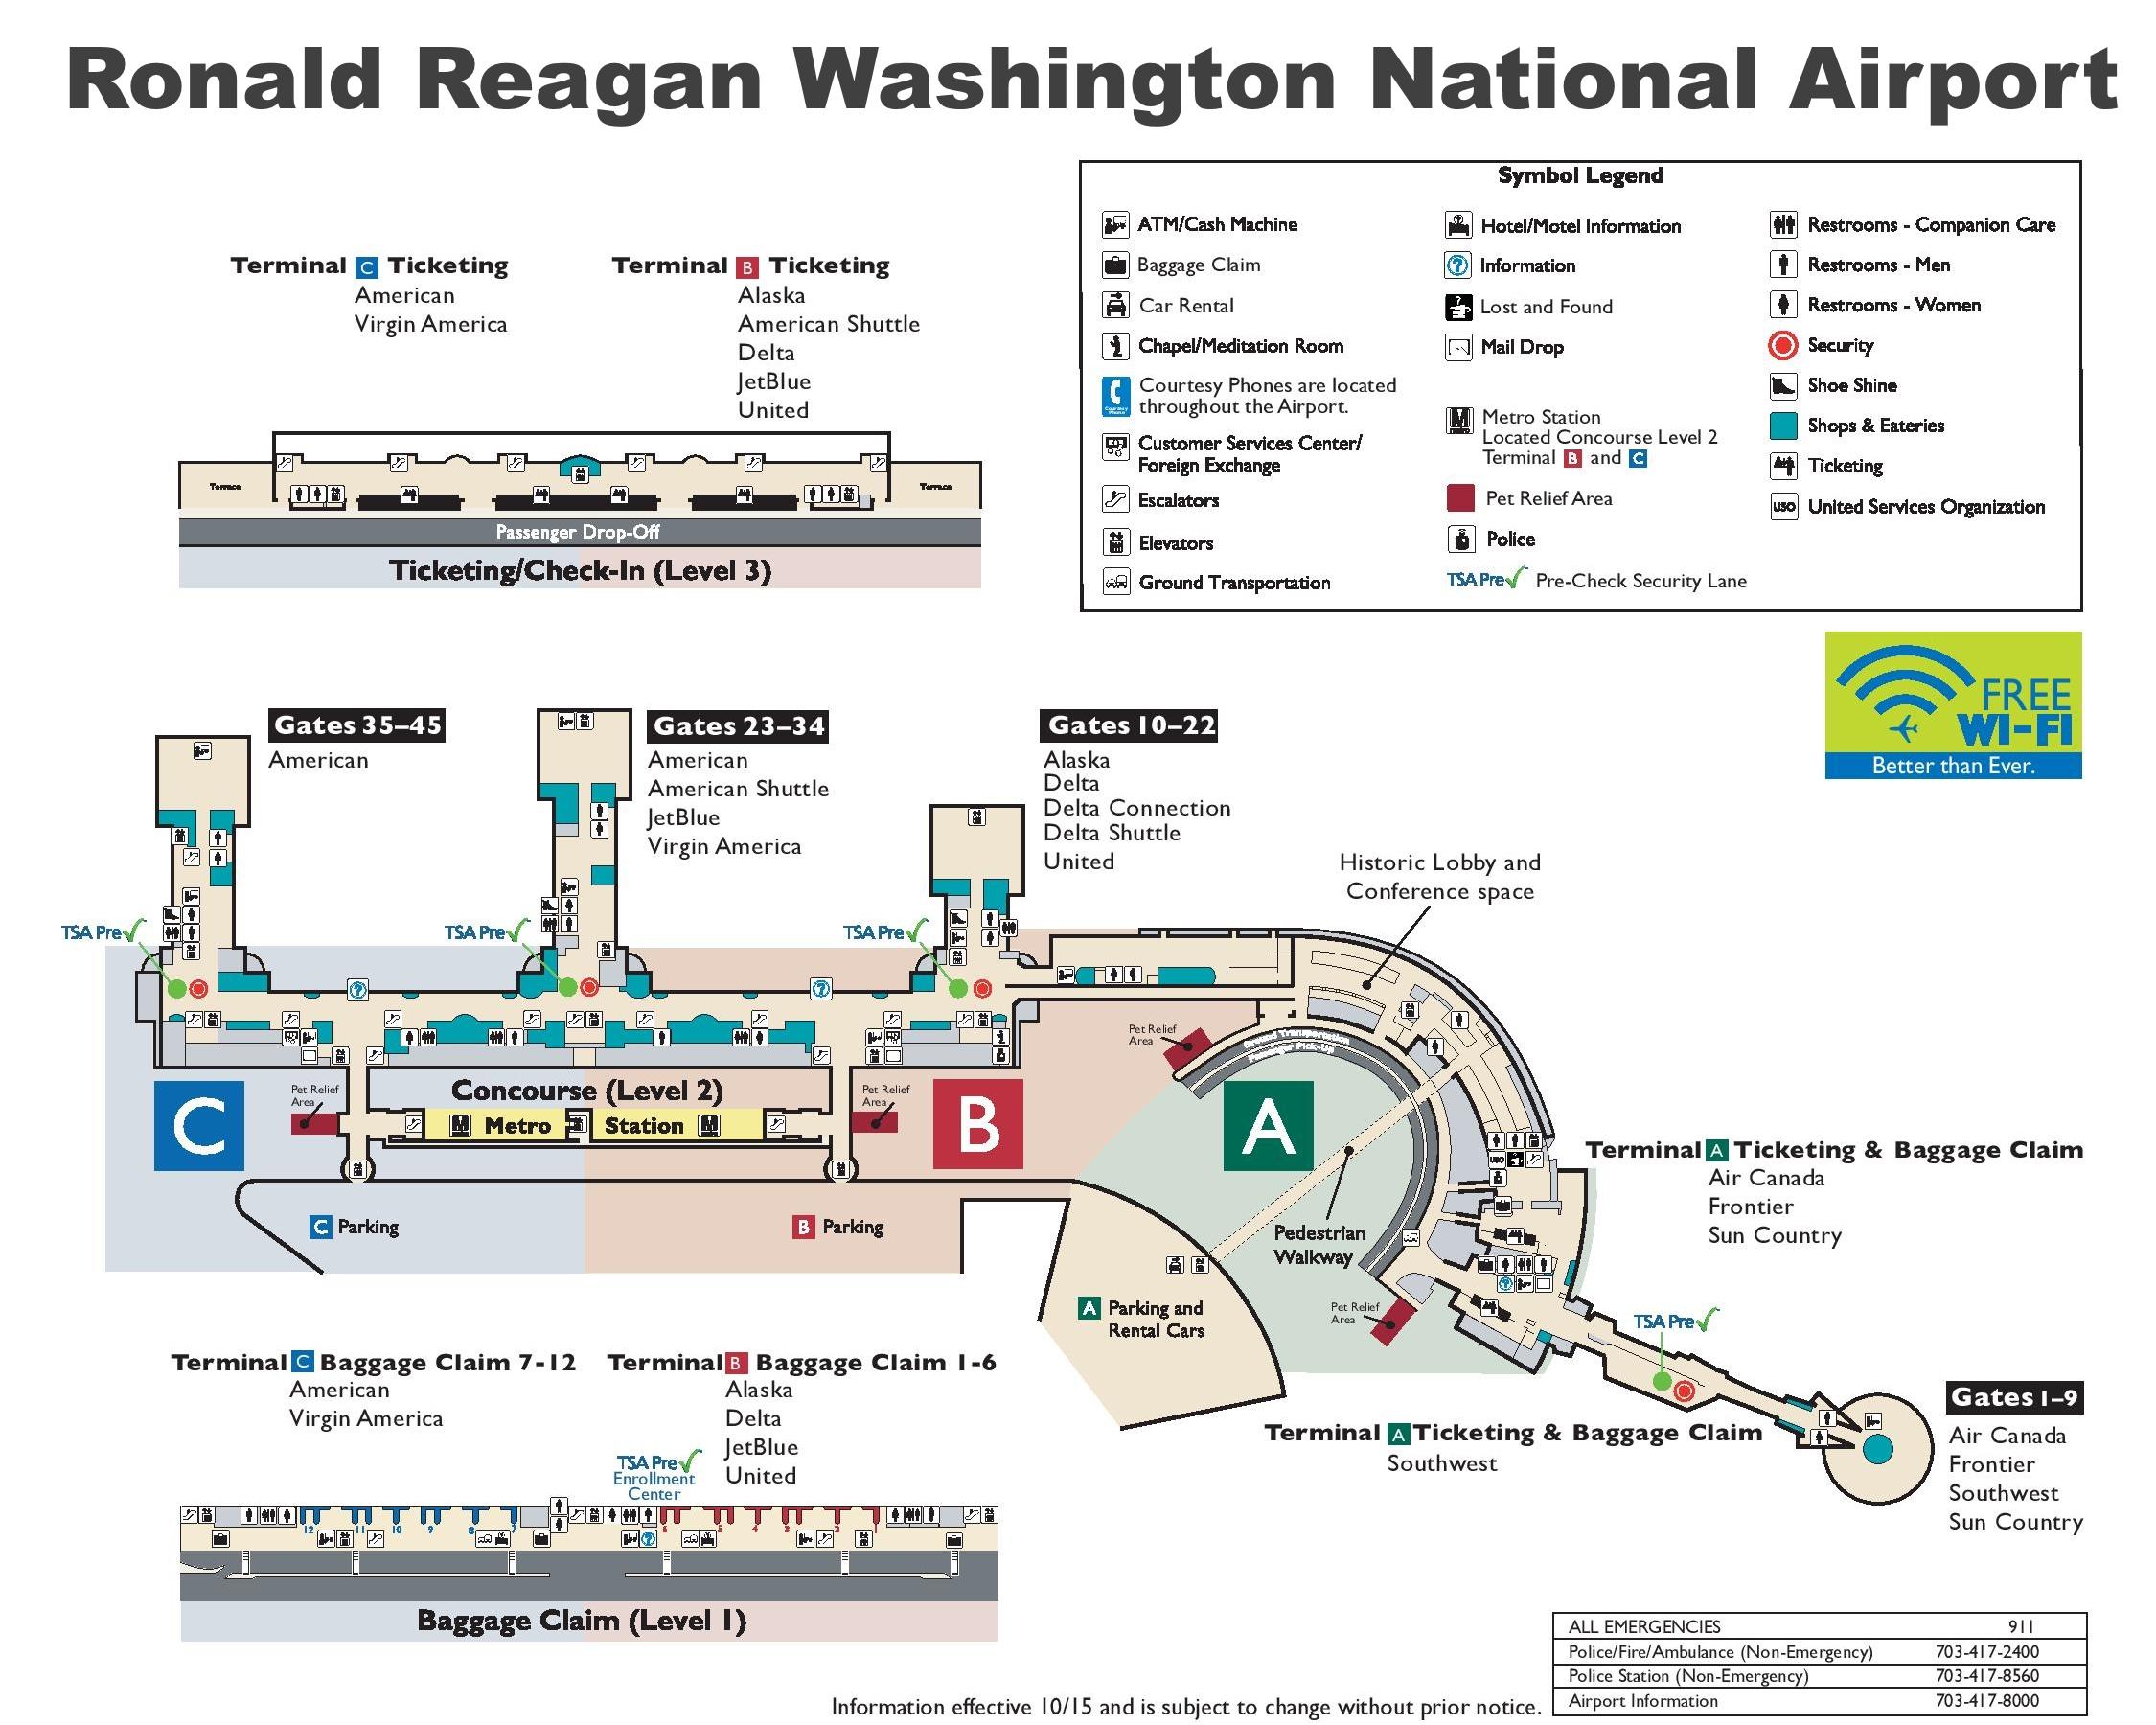 Washington Reagan Airport Map Ronald Reagan Washington National Airport map Washington Reagan Airport Map